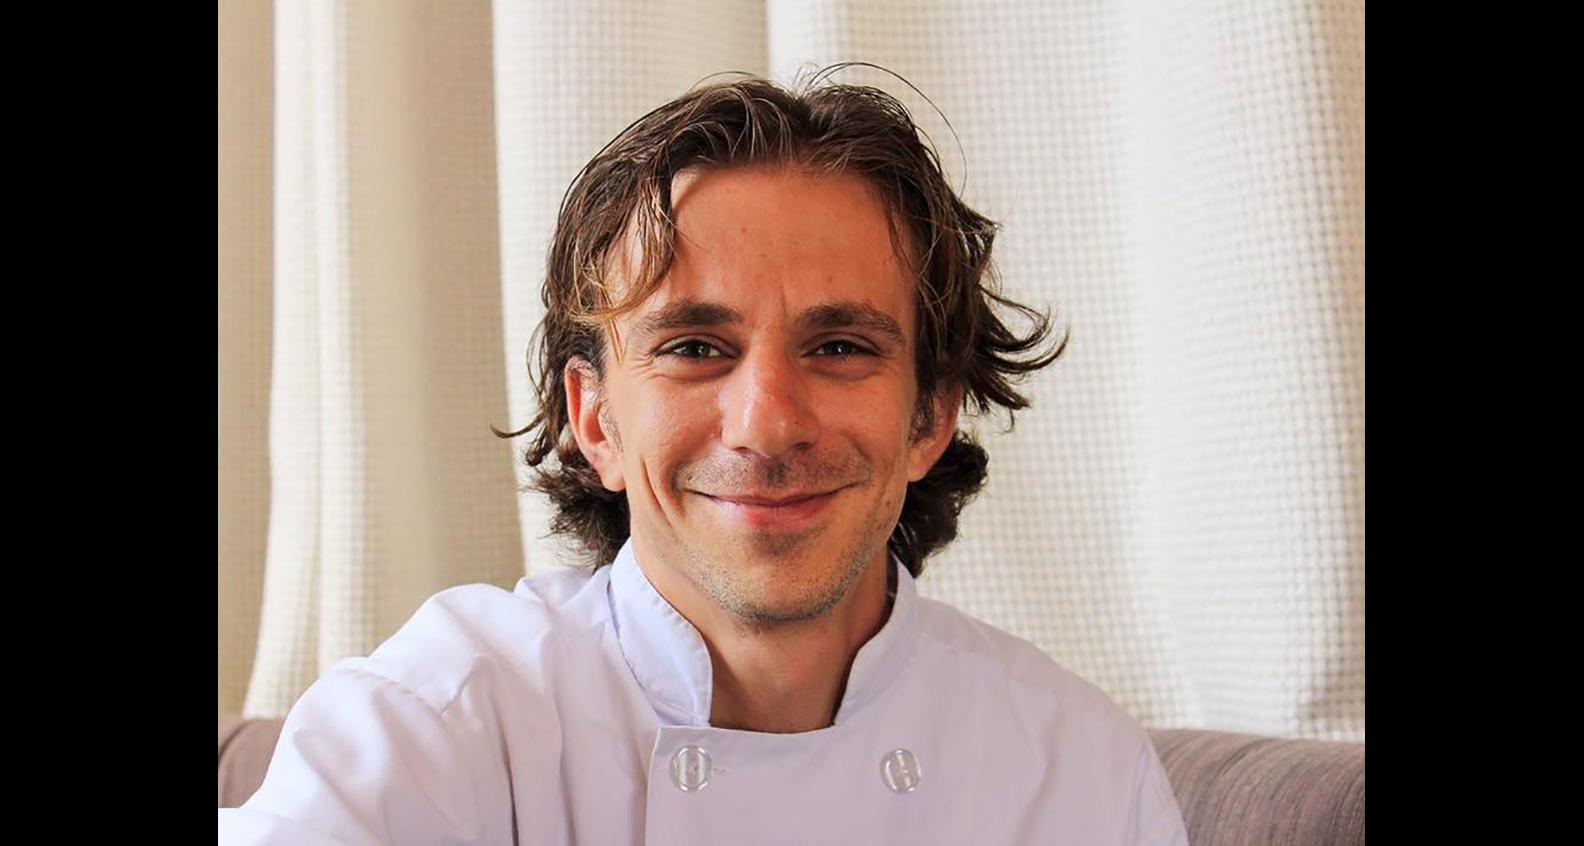 Chef Chris Amendola